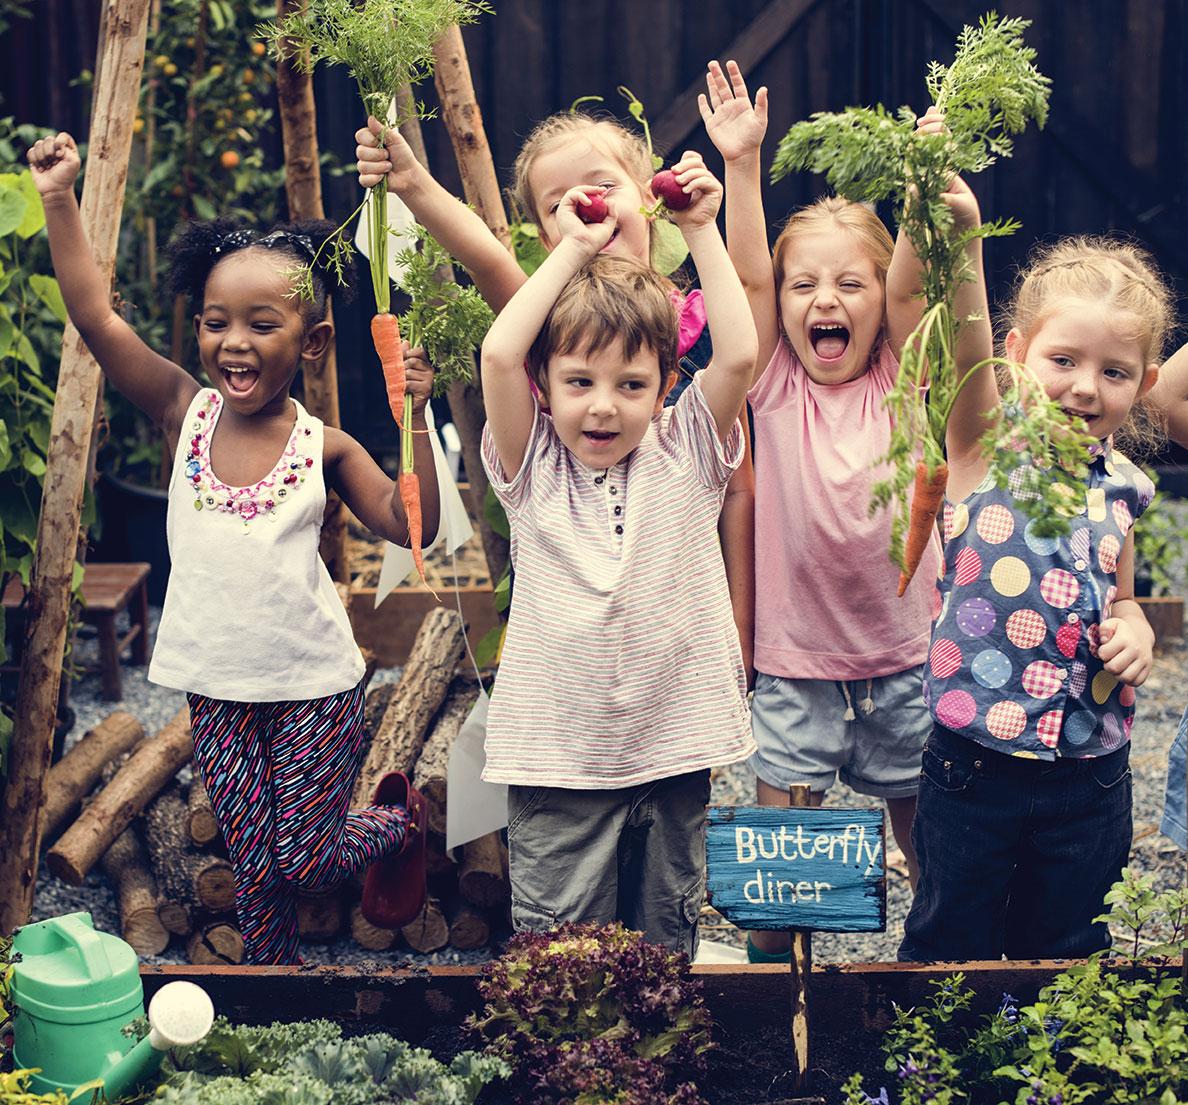 Encourage Healthy Choices Gardening